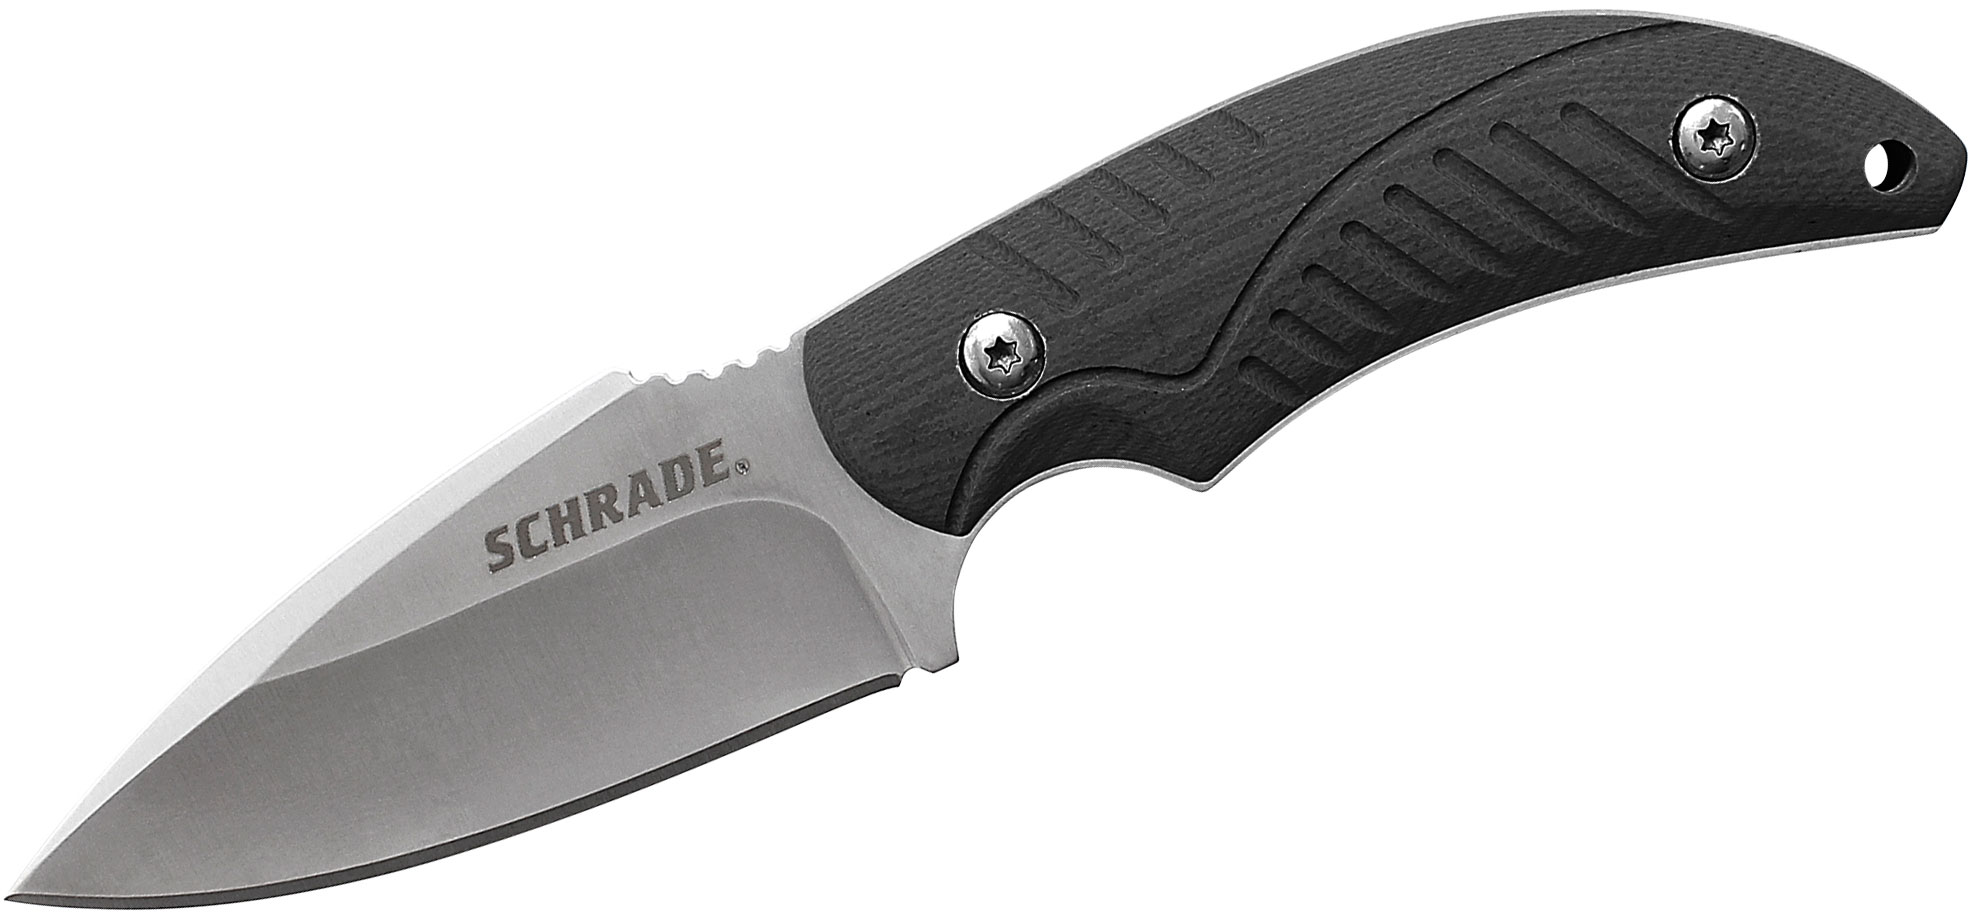 Schrade SCHF66 Survival Fixed 2.9 inch Satin Plain Blade, Thermoplastic Rubber Handles, Nylon Sheath